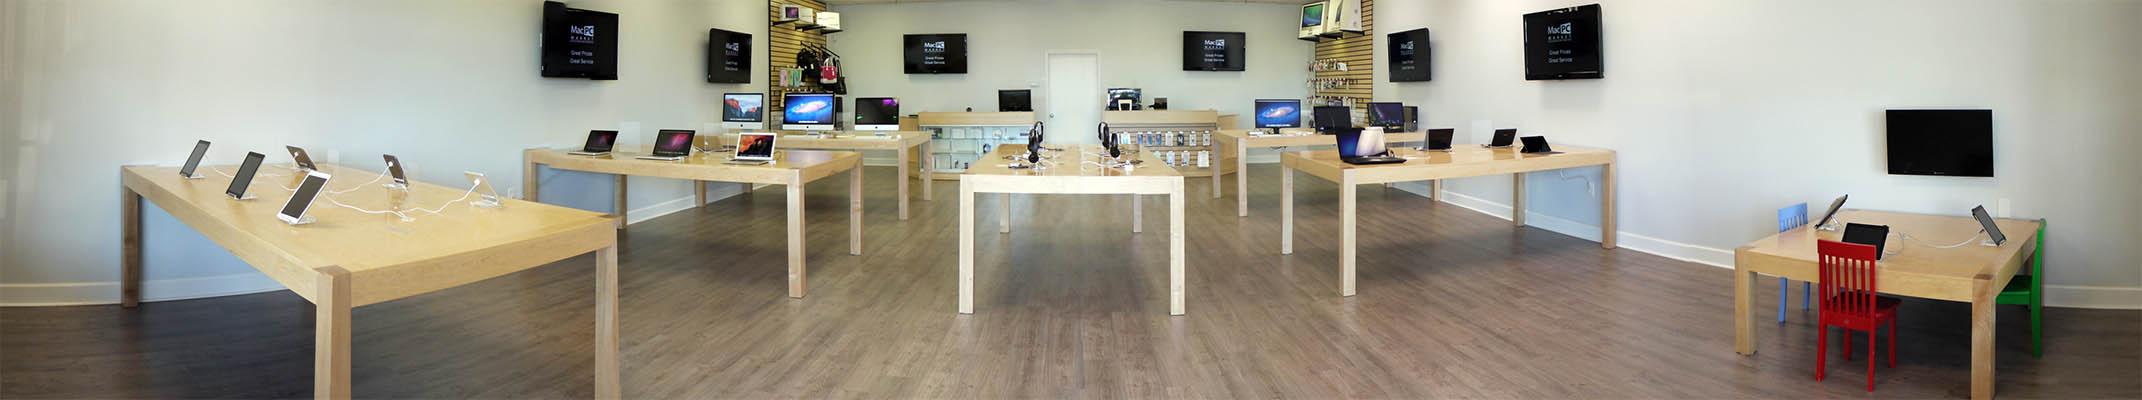 MacPC Market Sales Service Repair Computers Apple